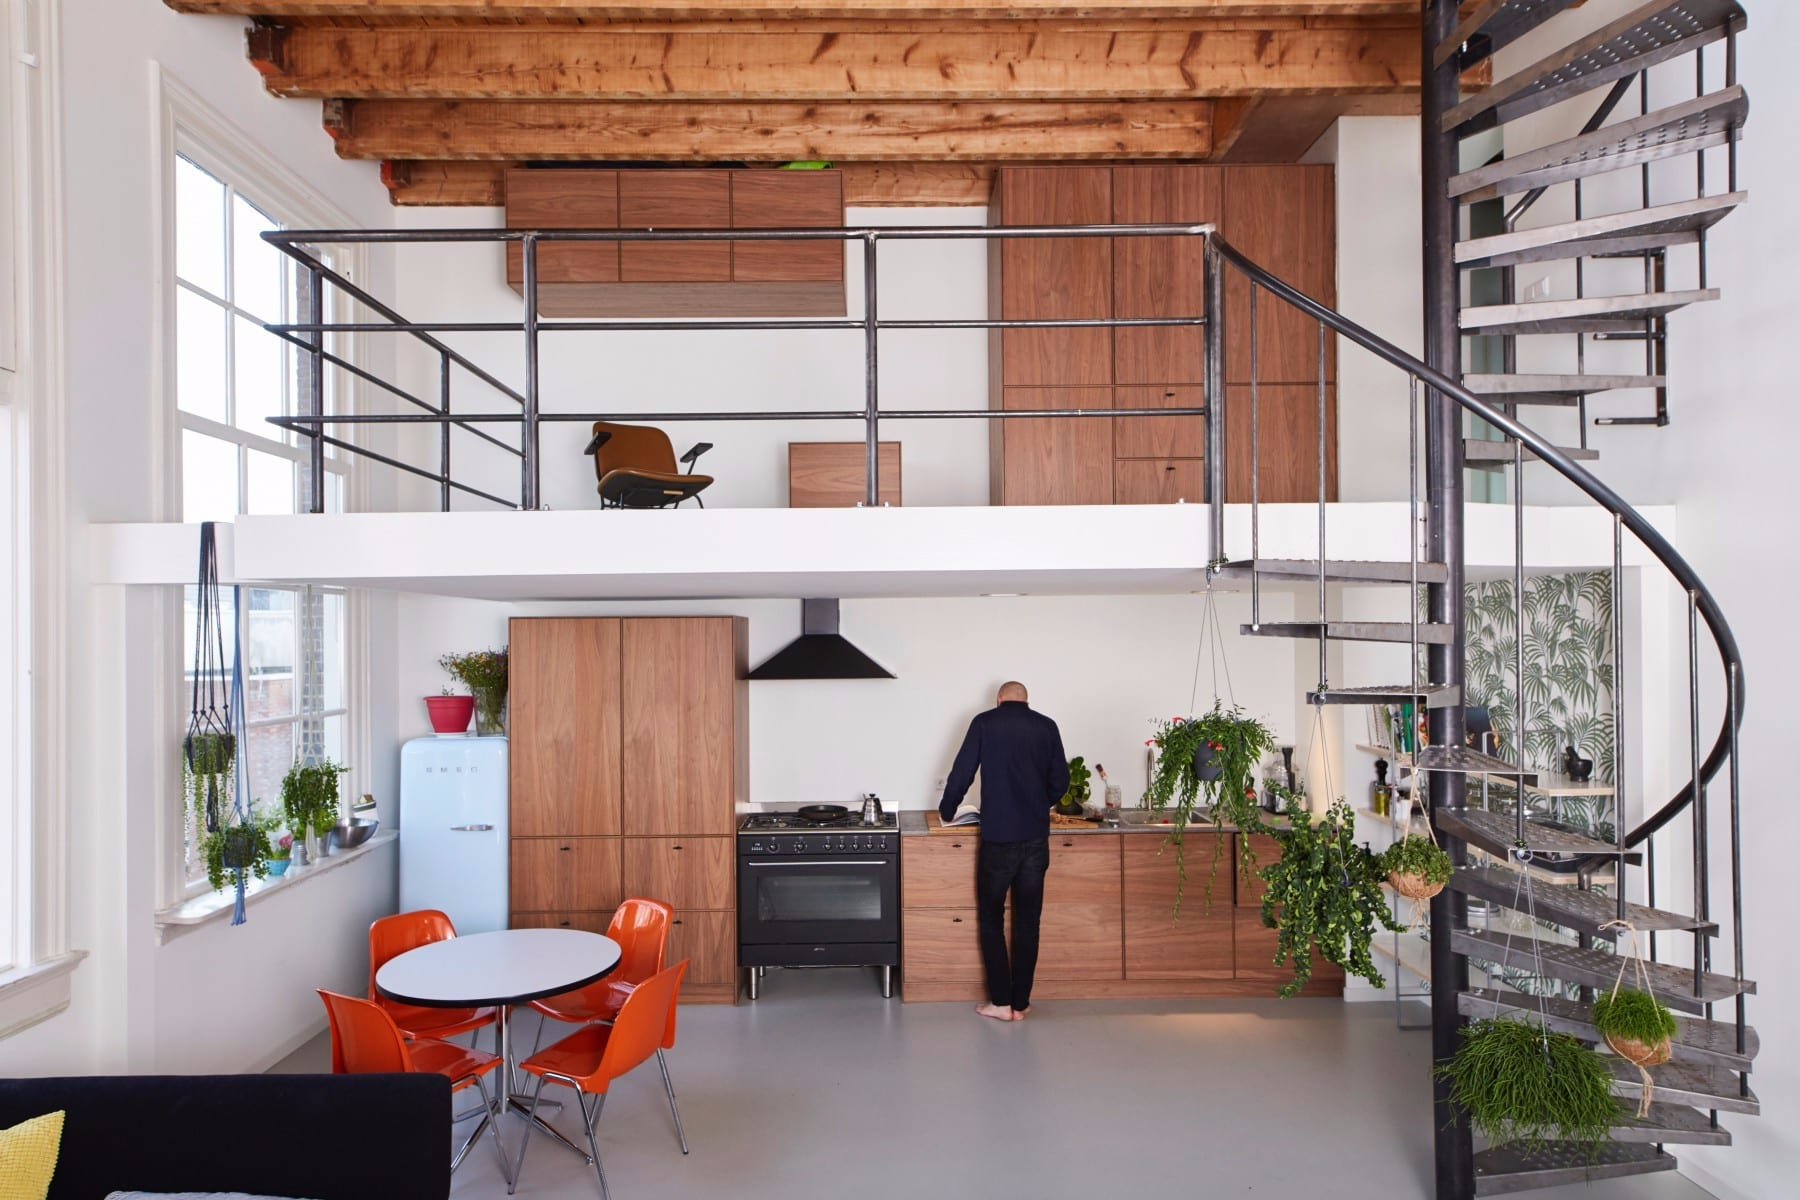 Keuken industriele loft home design idee n en meubilair inspiraties - Keuken industriele loft ...